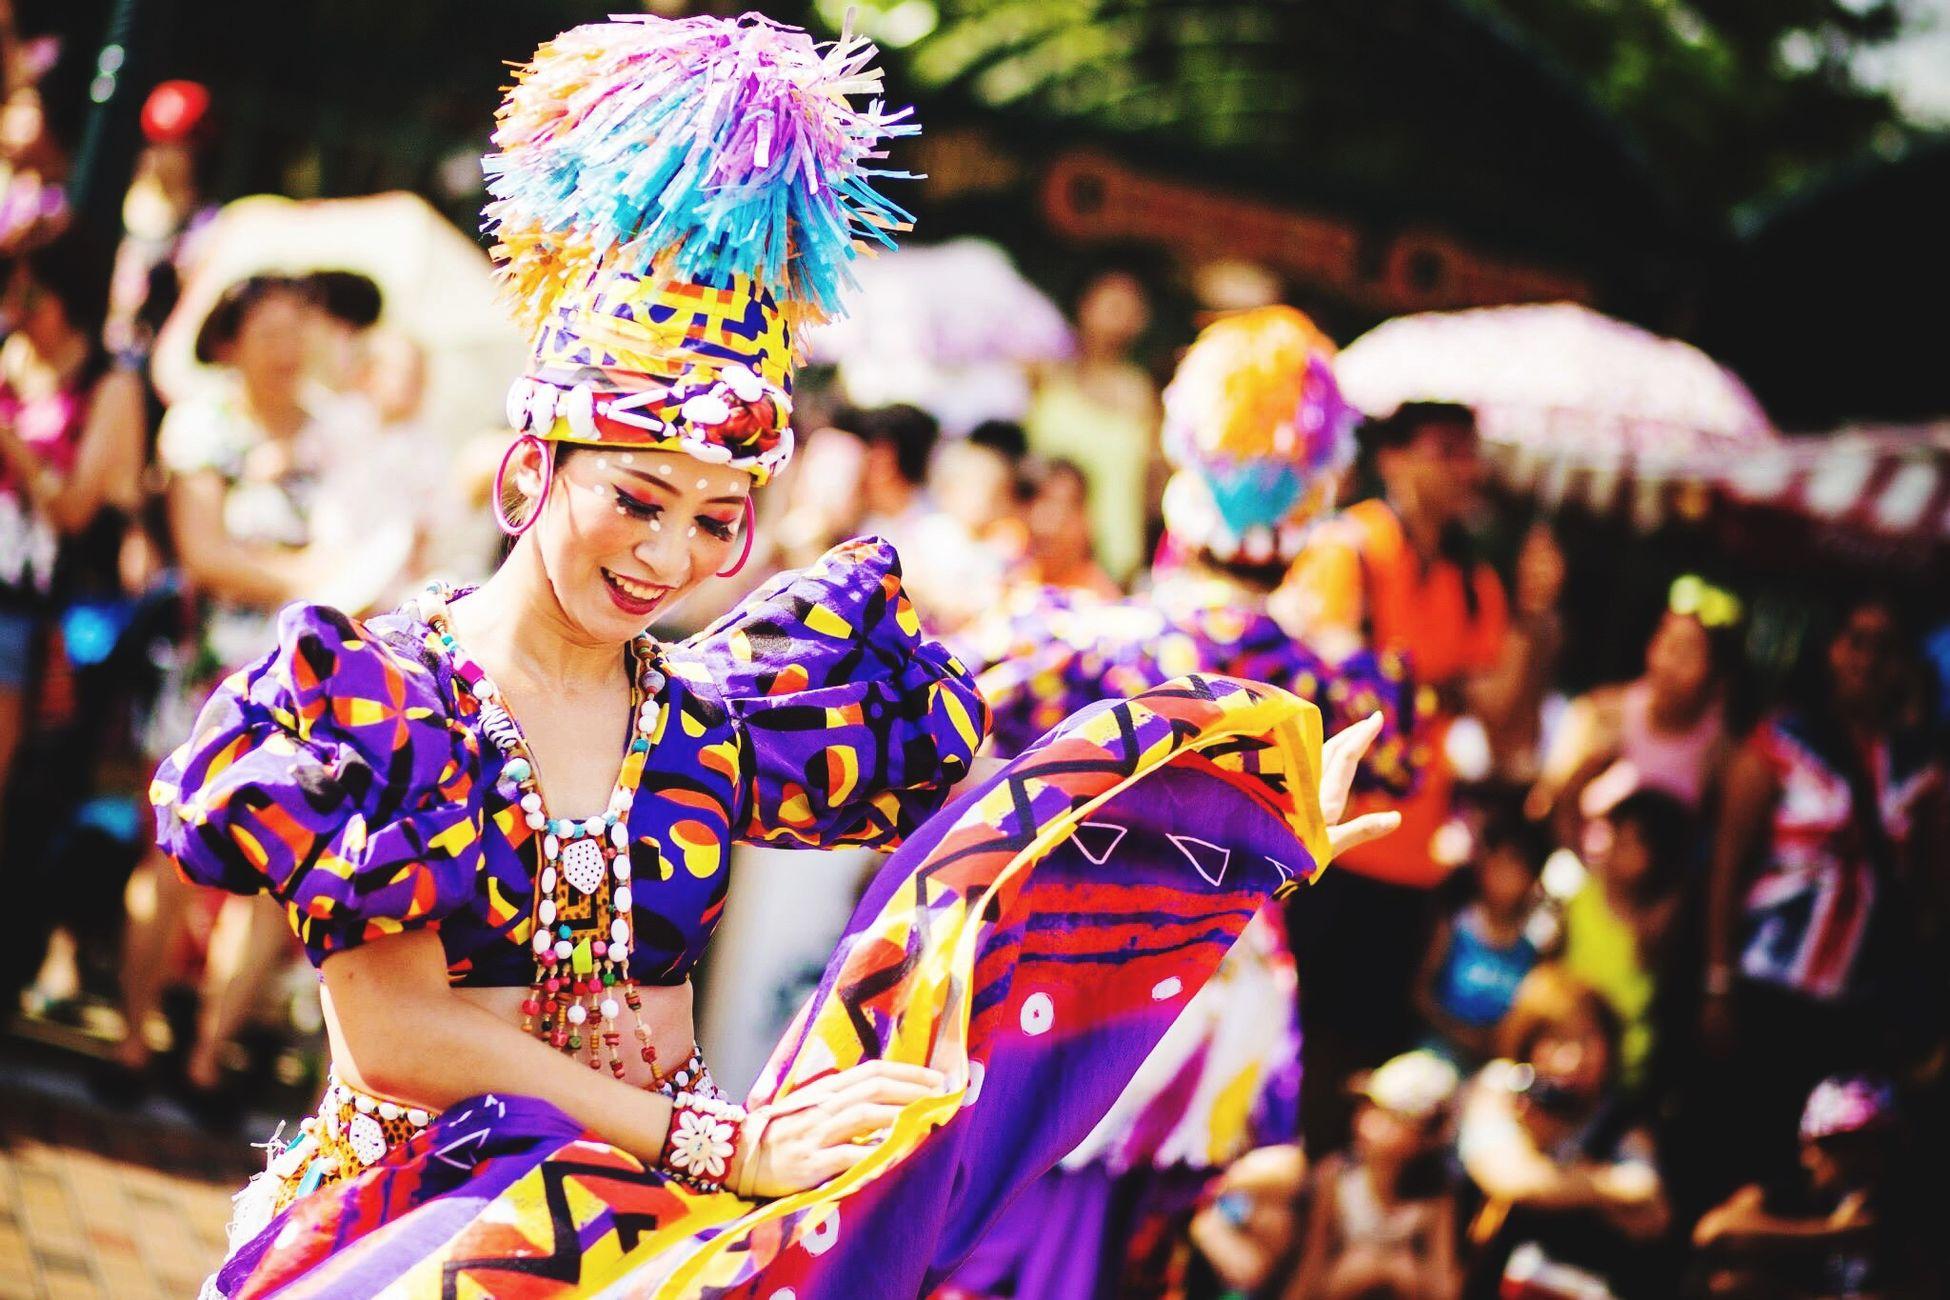 Alway do Jungle girl,but still love it Disneyland Parade Dancer